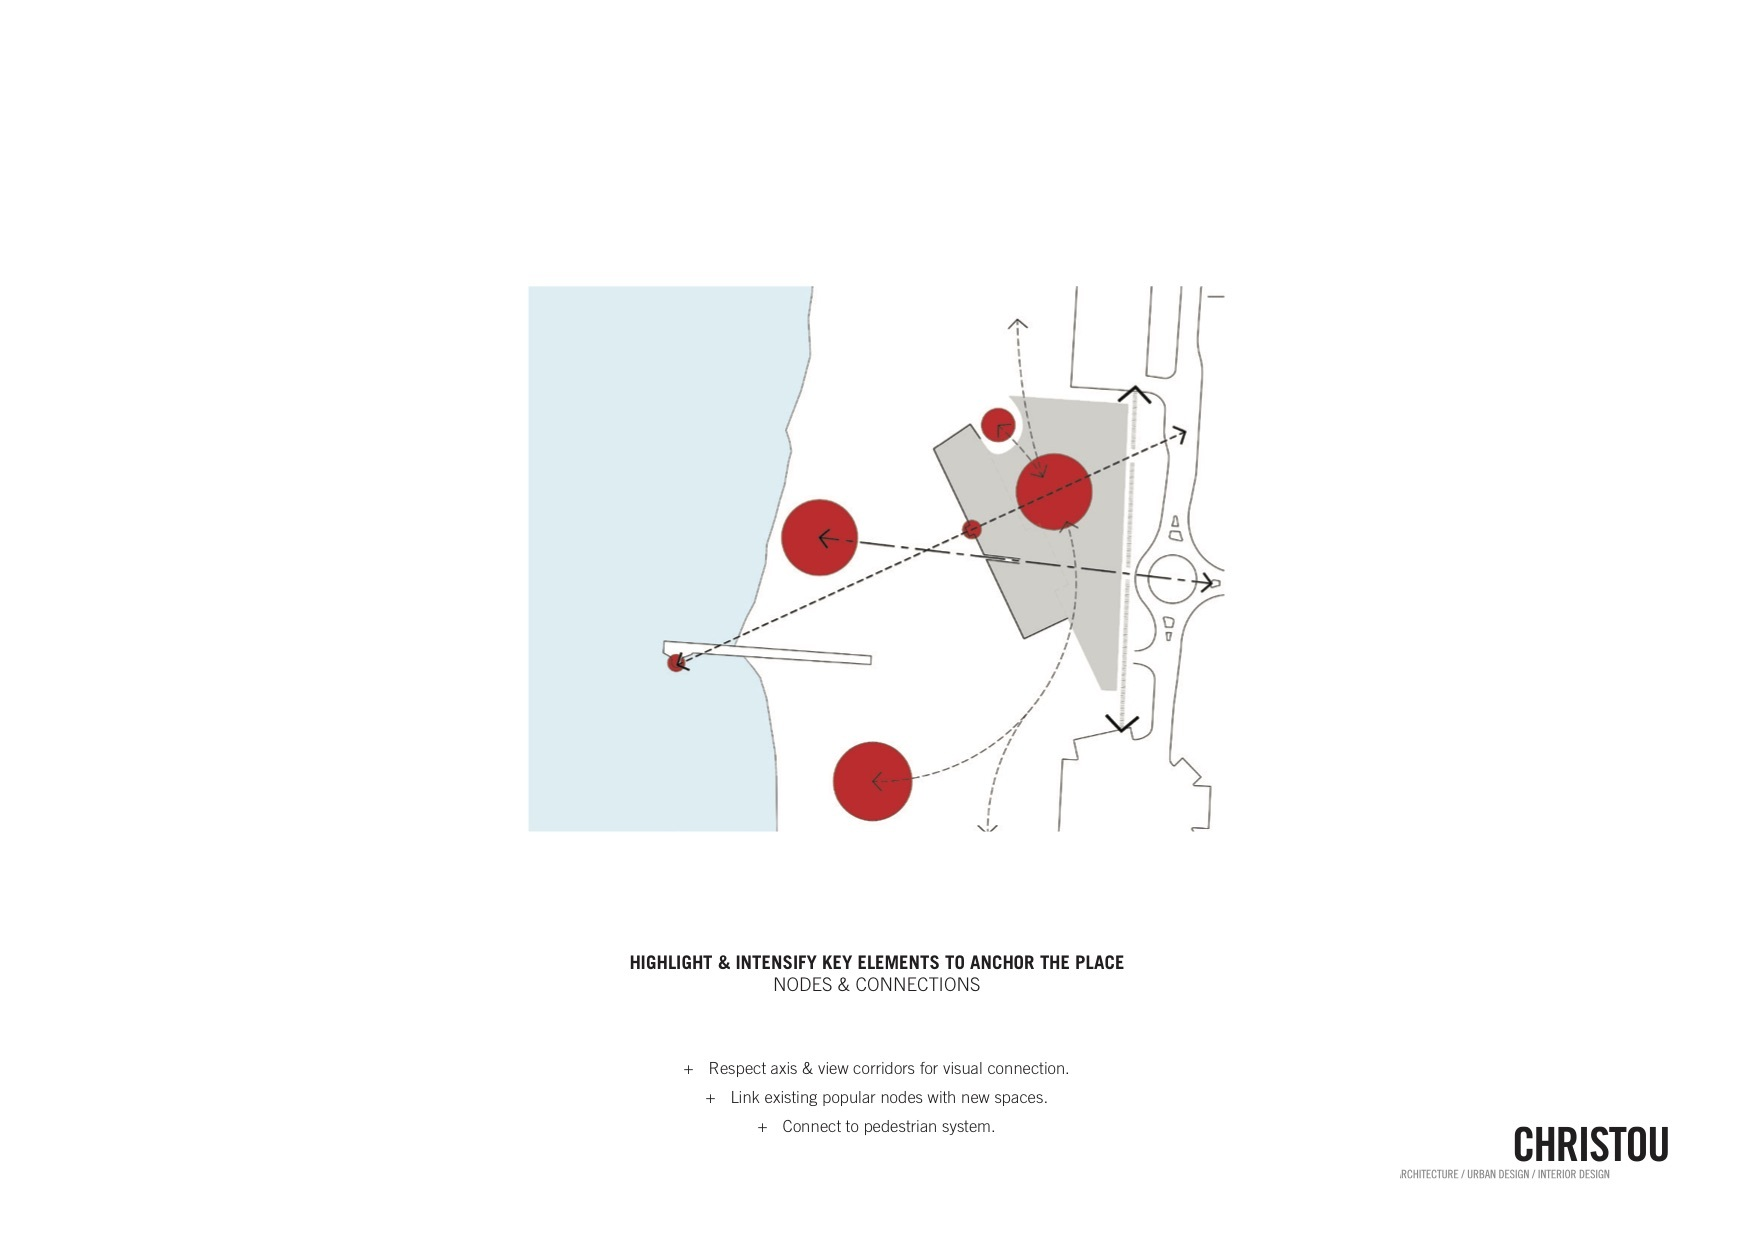 Galería de Surf Club City Beach / Christou Design Group - 26 on interior design board layout, interior design plan view, interior design flowchart, interior design block diagram,